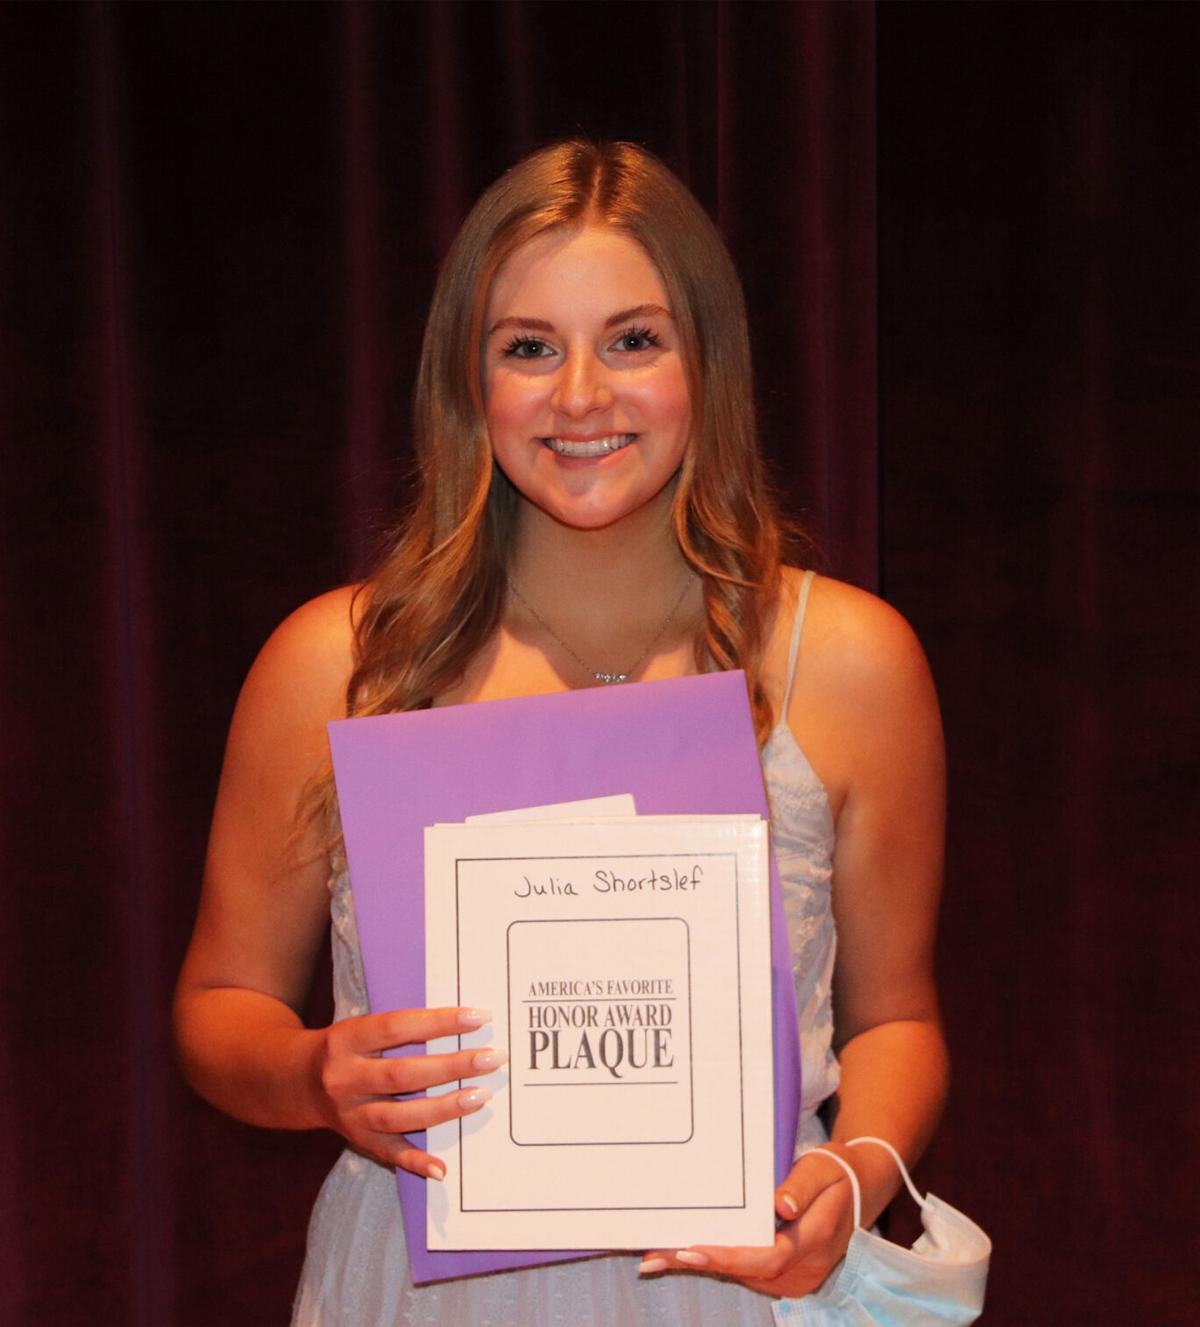 Scholarships awarded to Hannibal High School seniors